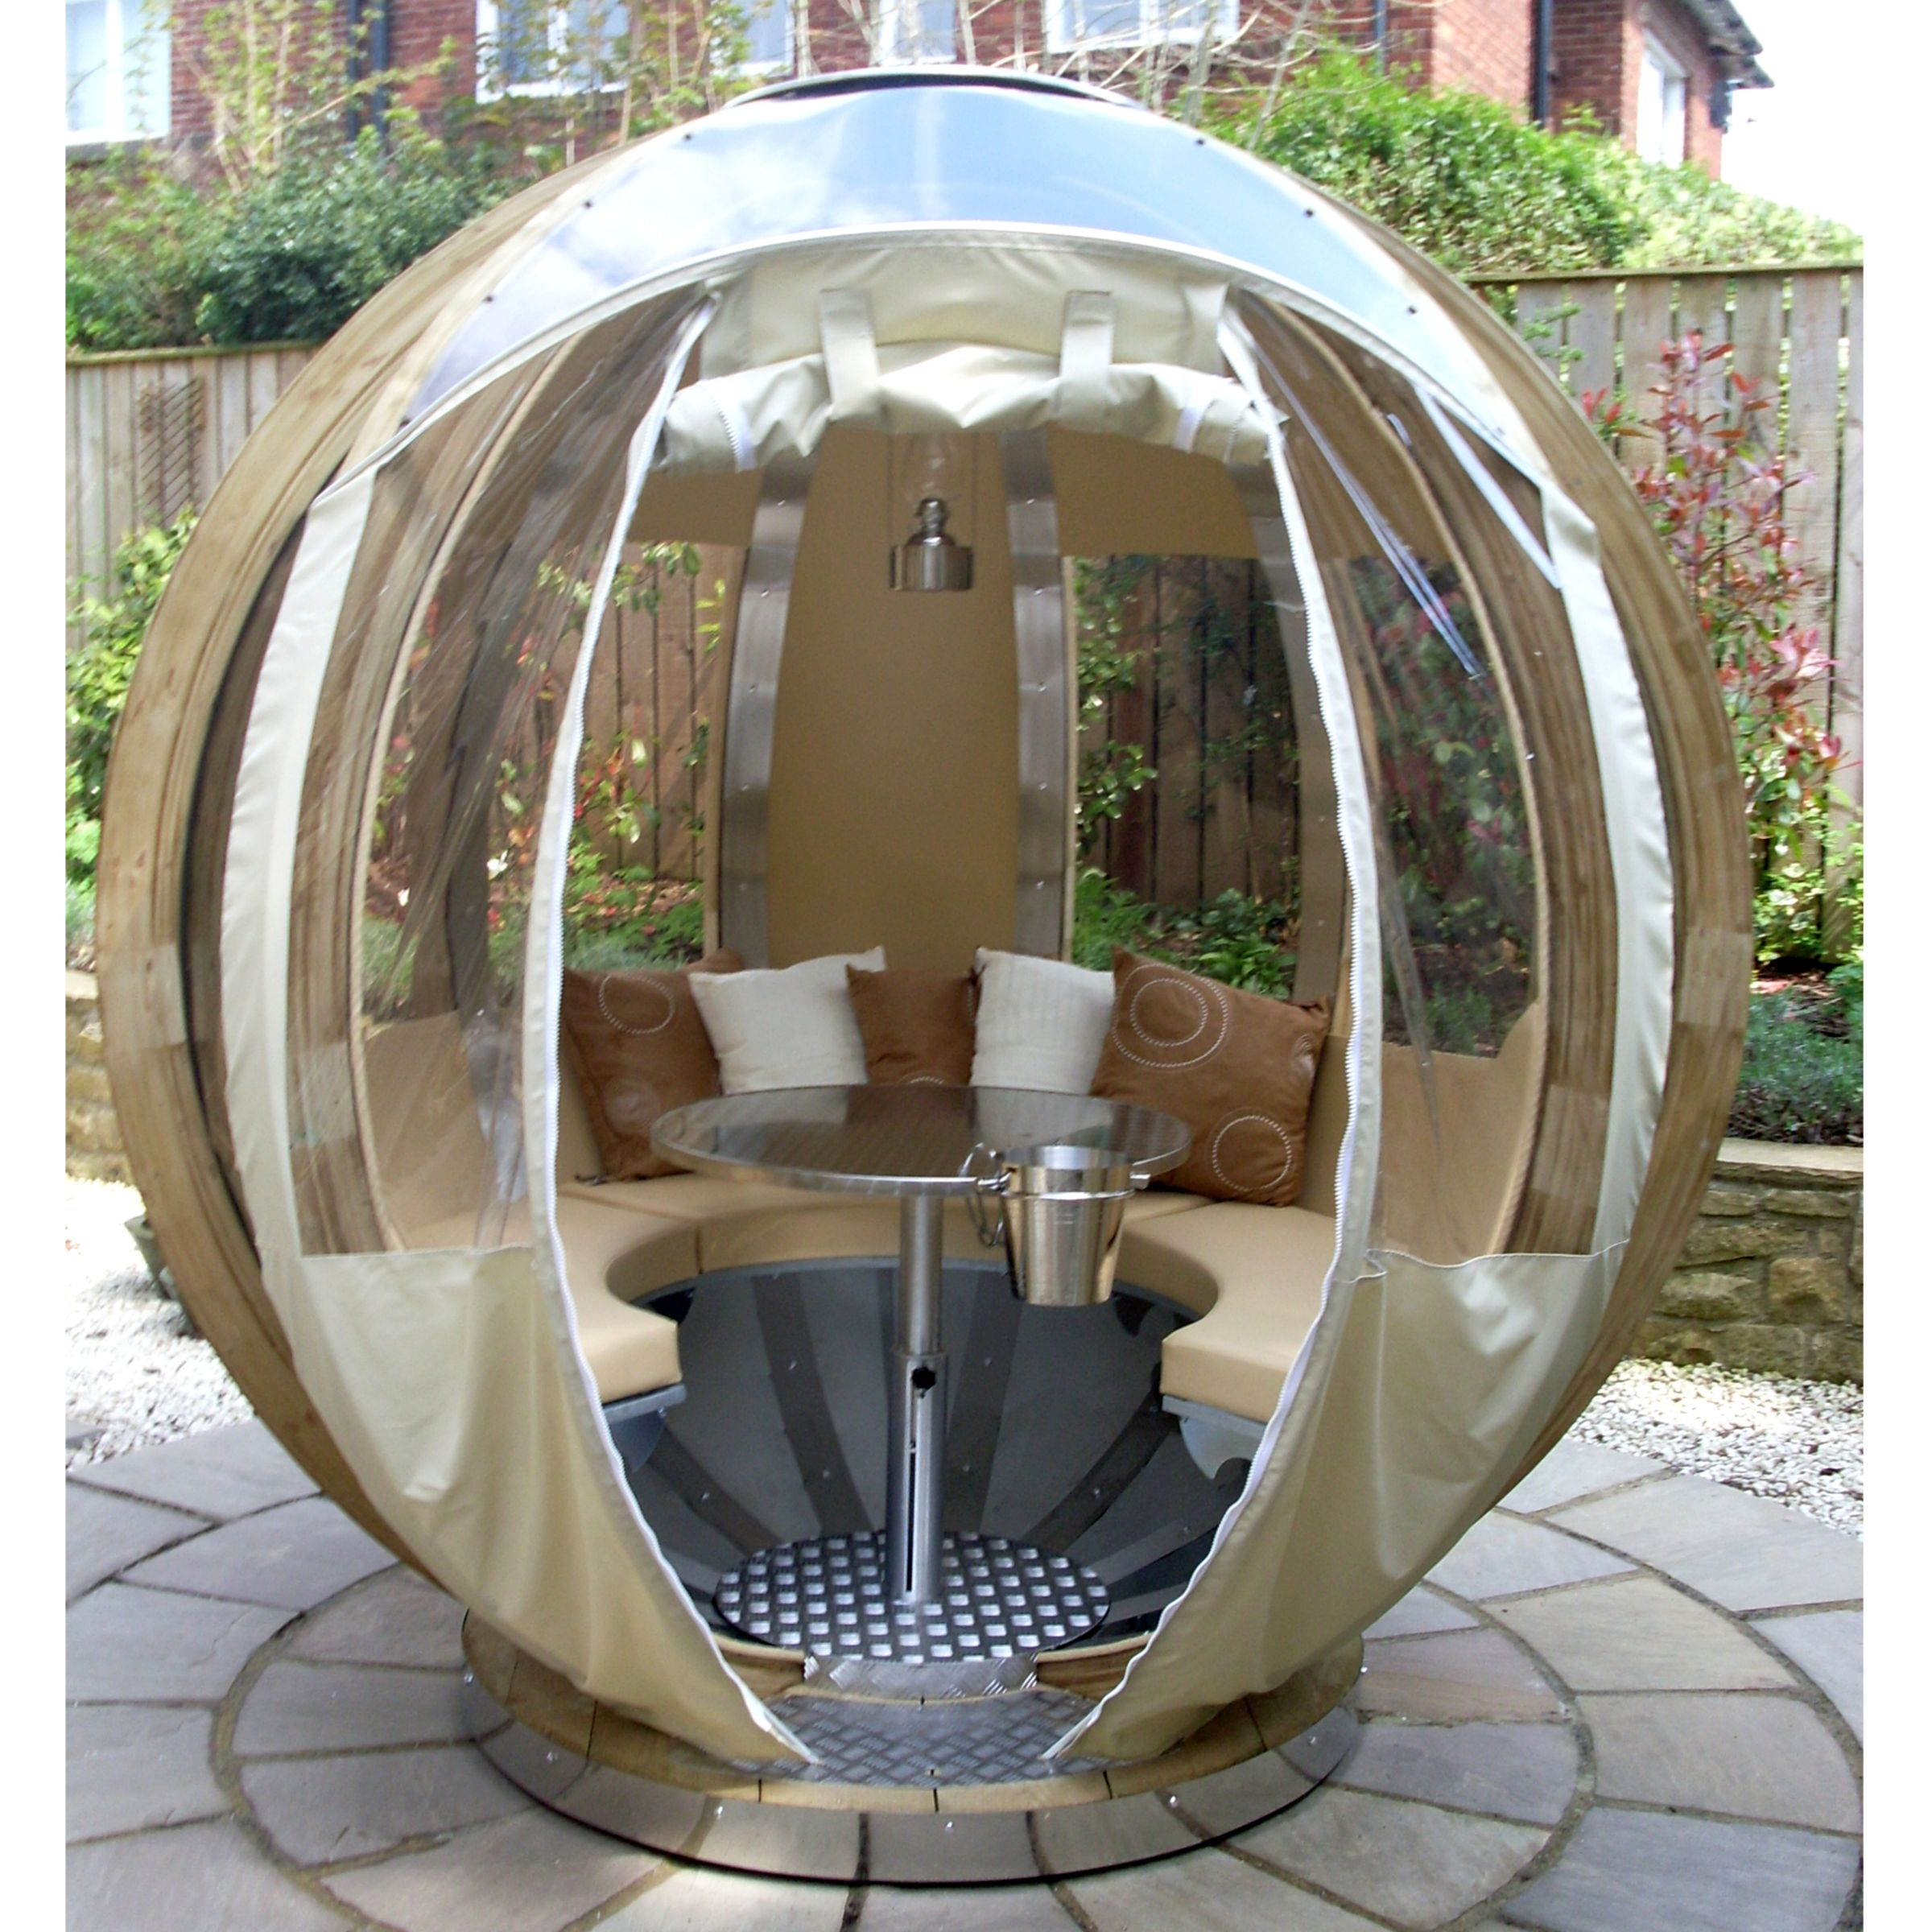 Farmer's Cottage Farmer's Cottage Rotating Sphere Lounger